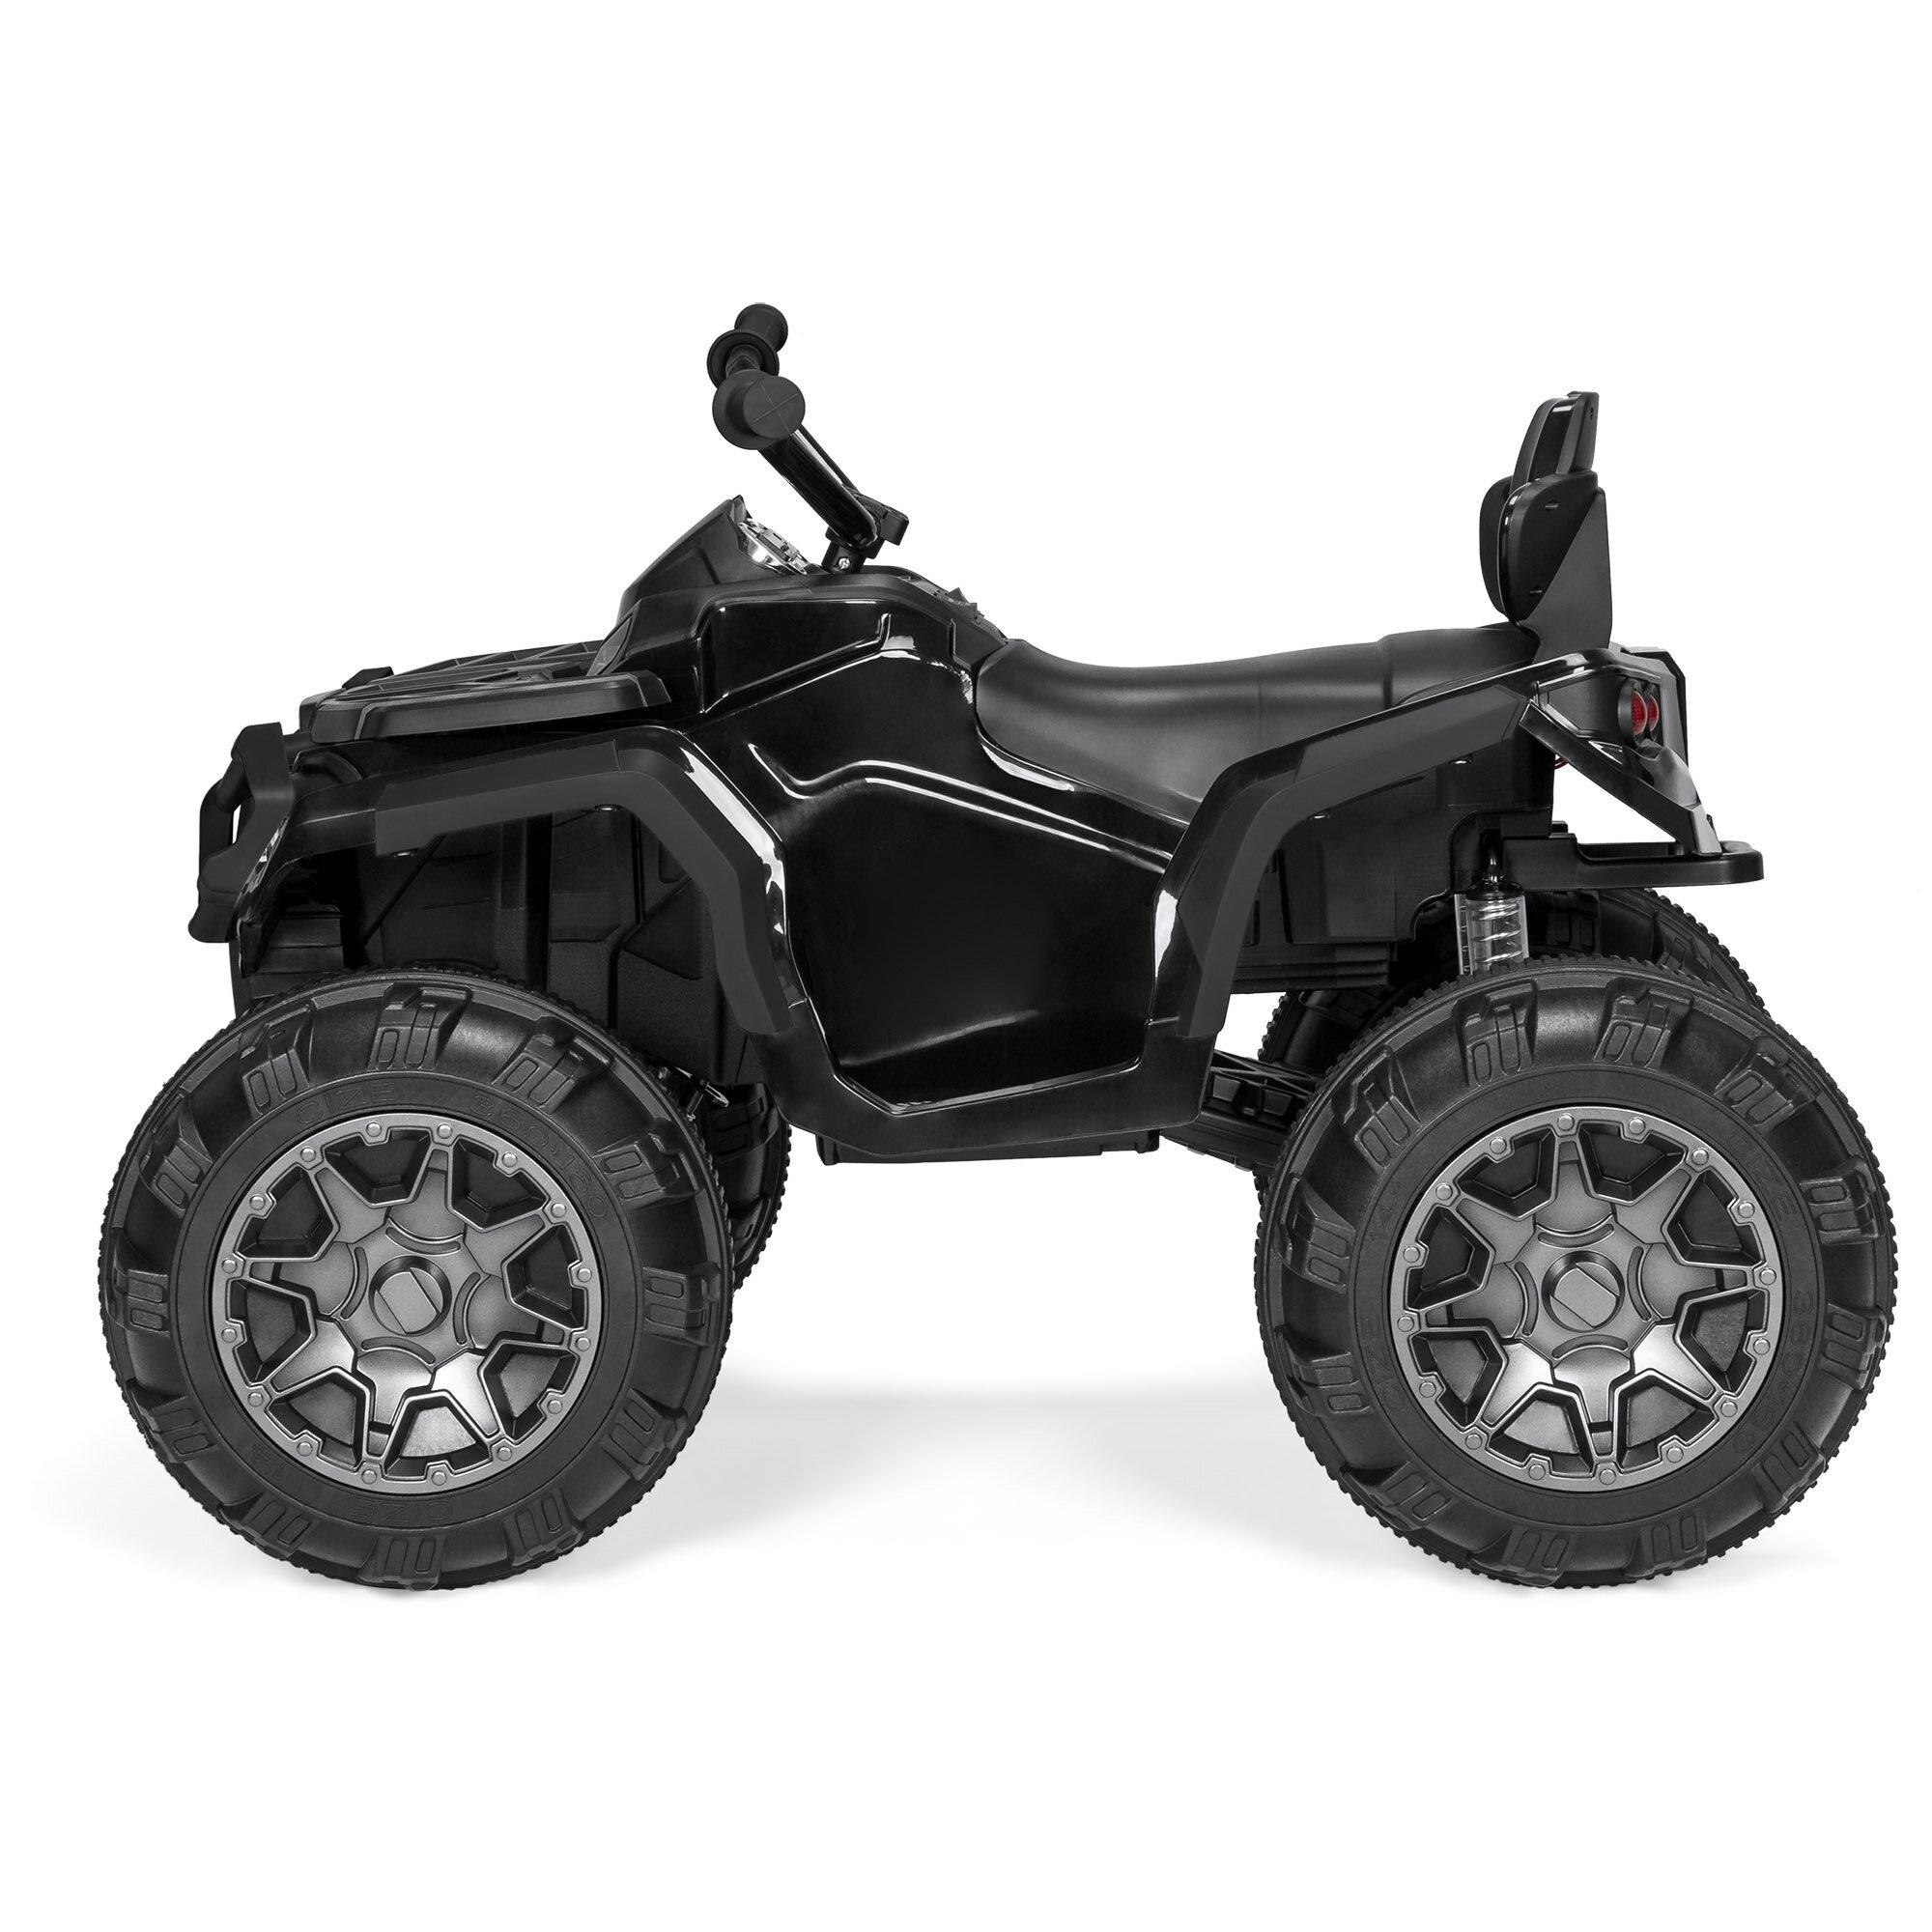 Best Choice Products 12V Kids 4-Wheeler ATV Quad Ride-On Car Toy w/ 3 7mph  Max, LED Headlights, AUX Jack, Radio - Black